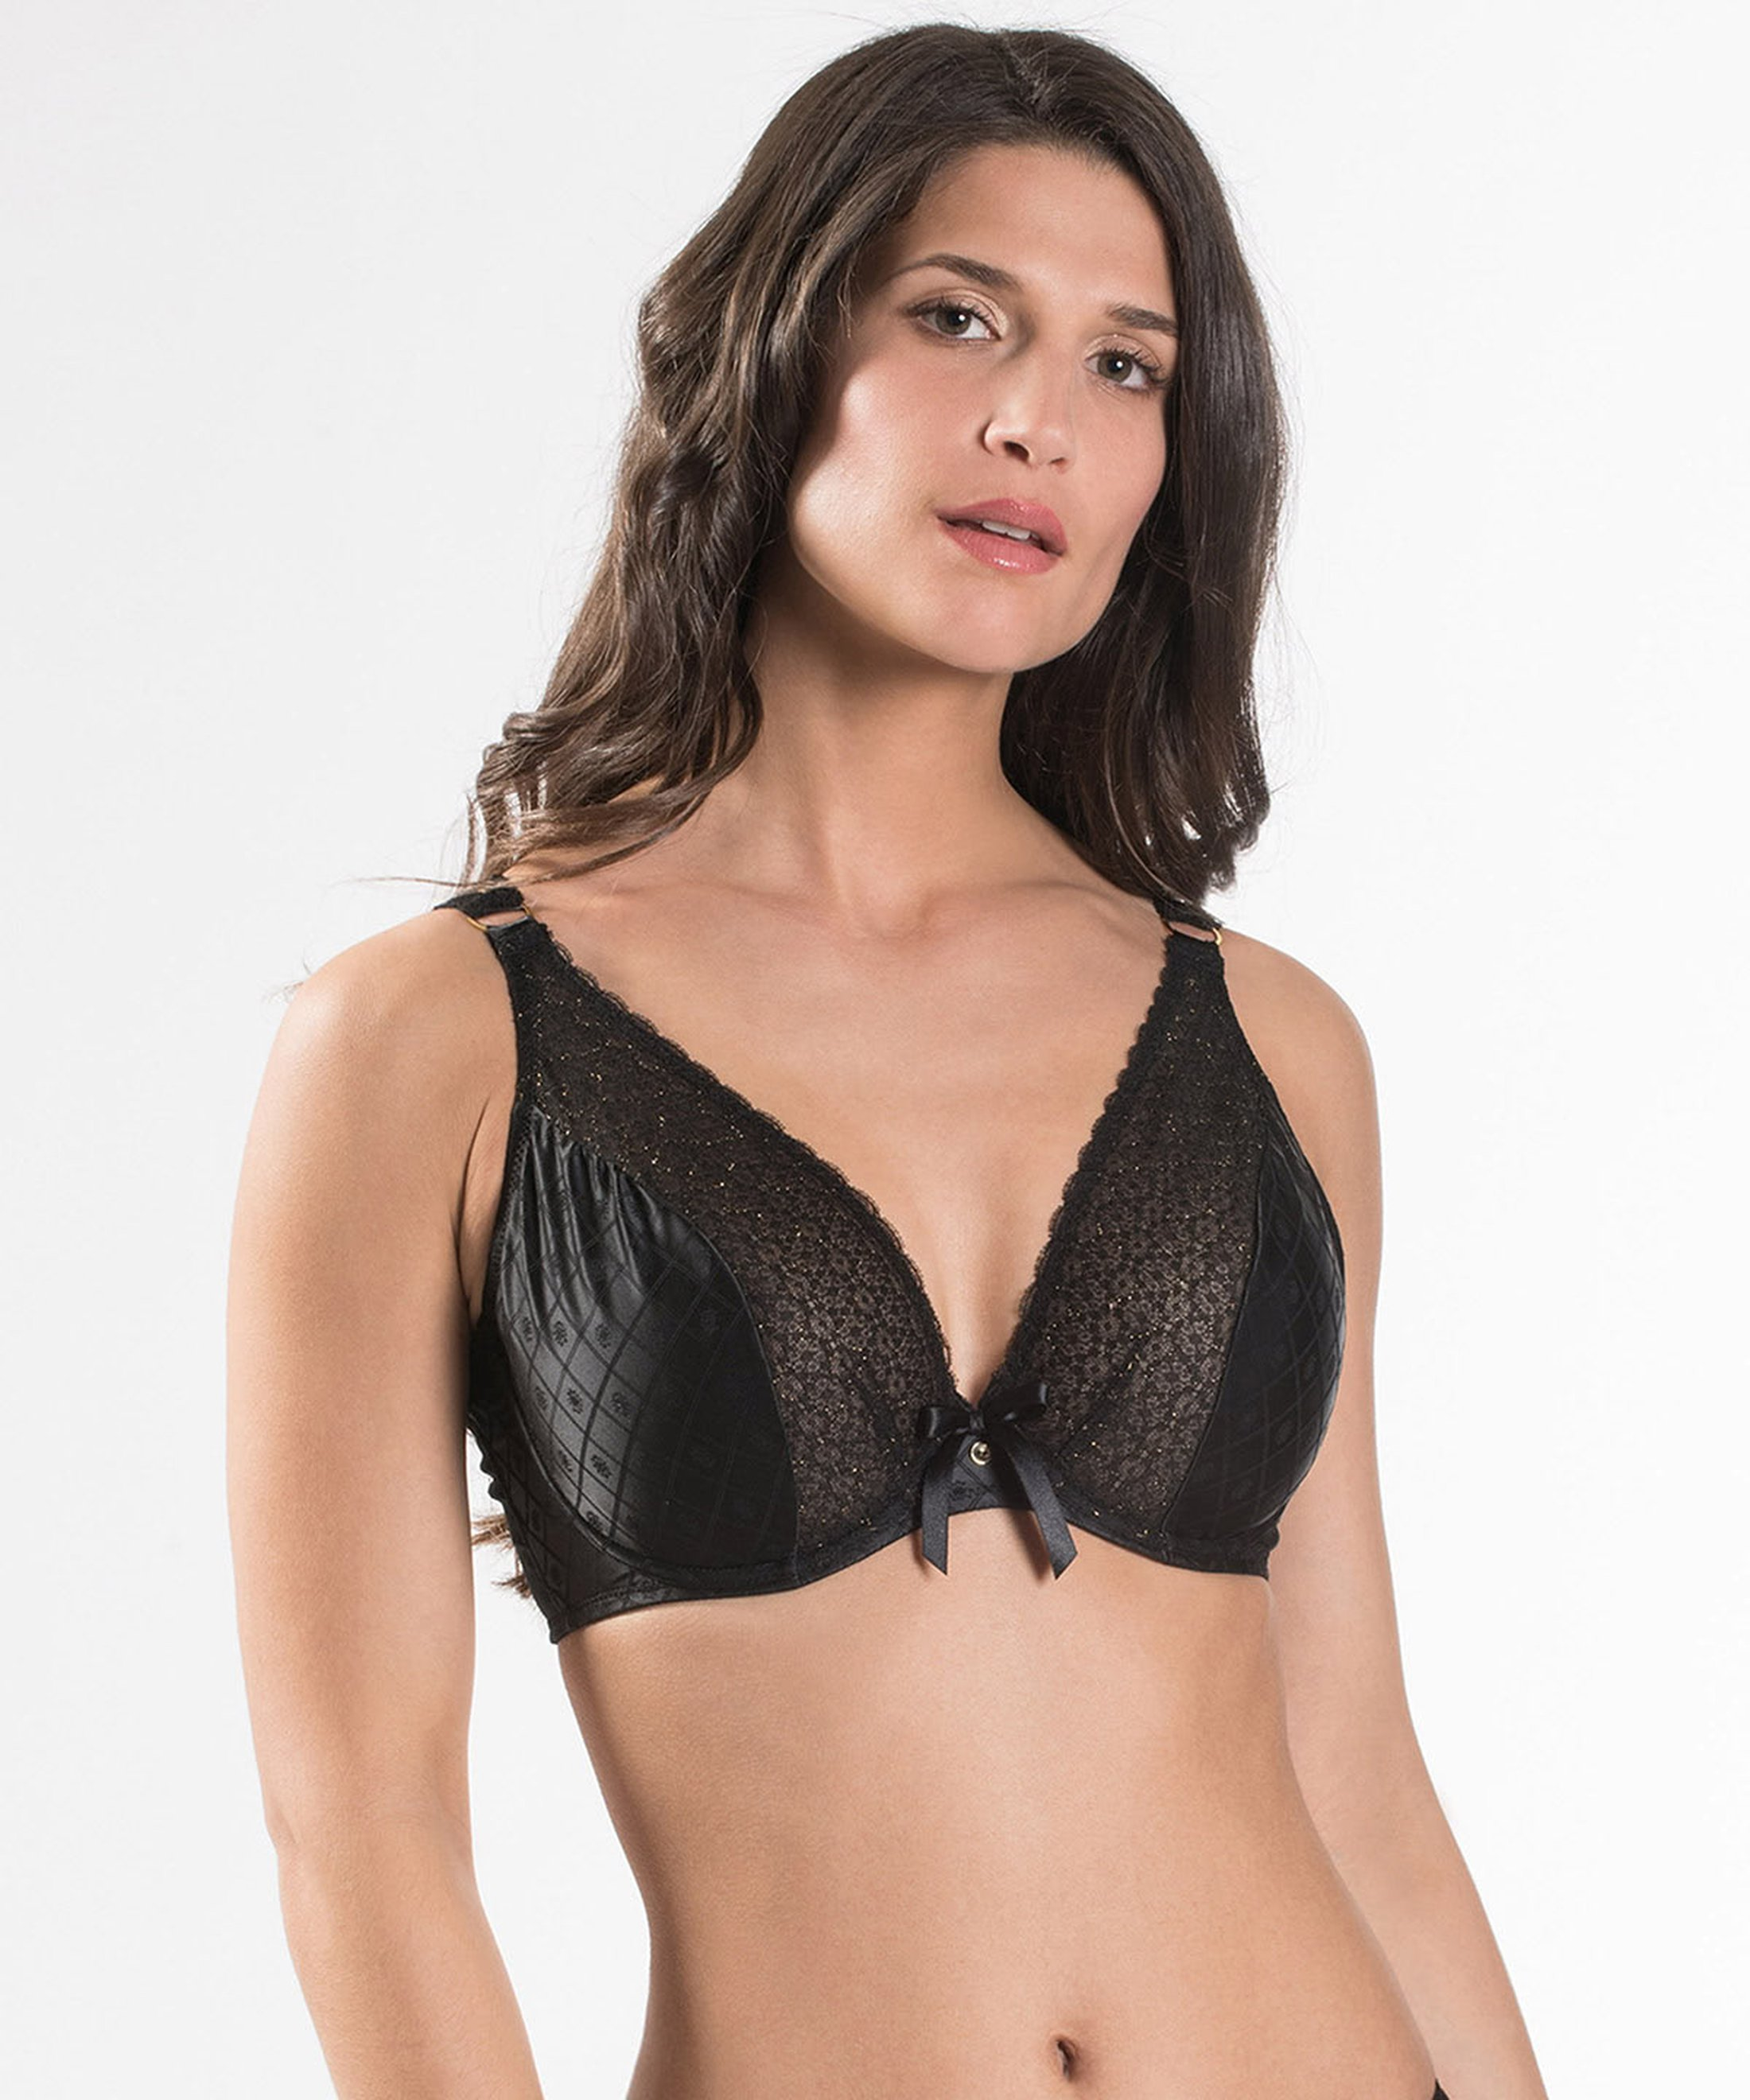 FEMME AUBADE Soutien-gorge triangle avec armatures confort Noir | Aubade